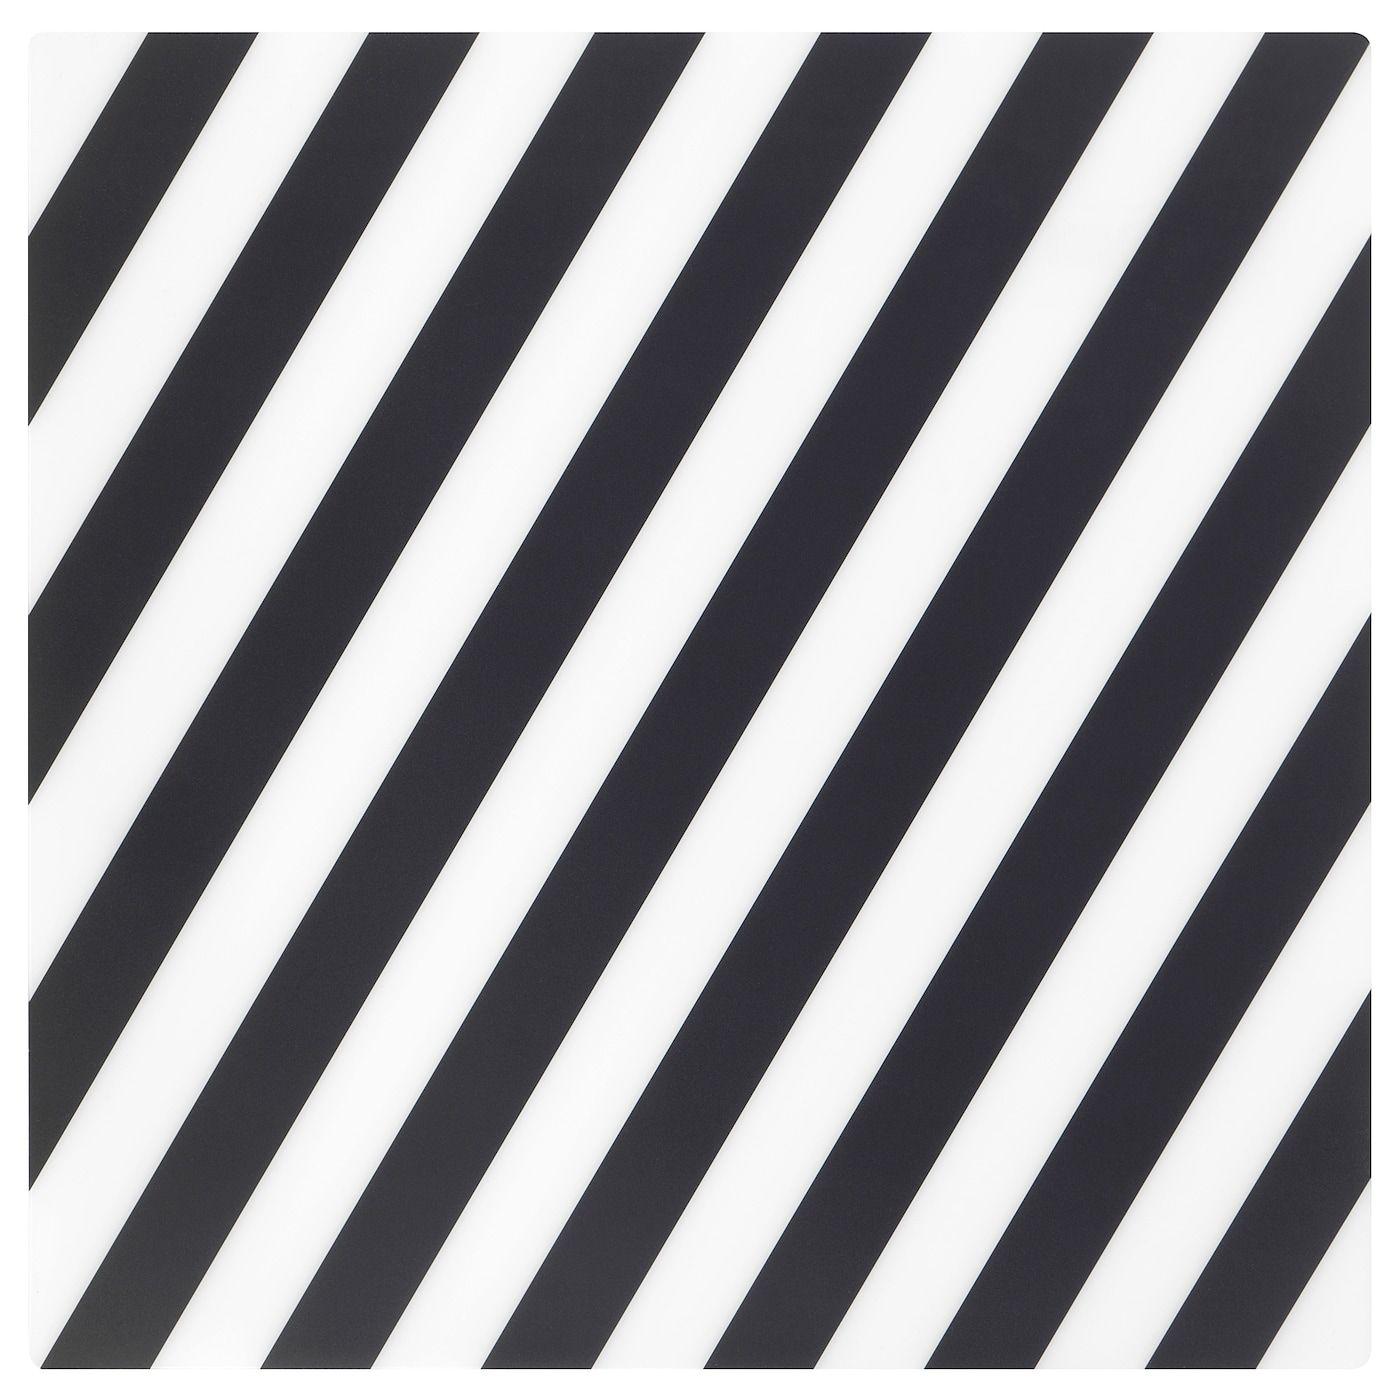 PIPIG Place mat - striped/black/white - IKEA